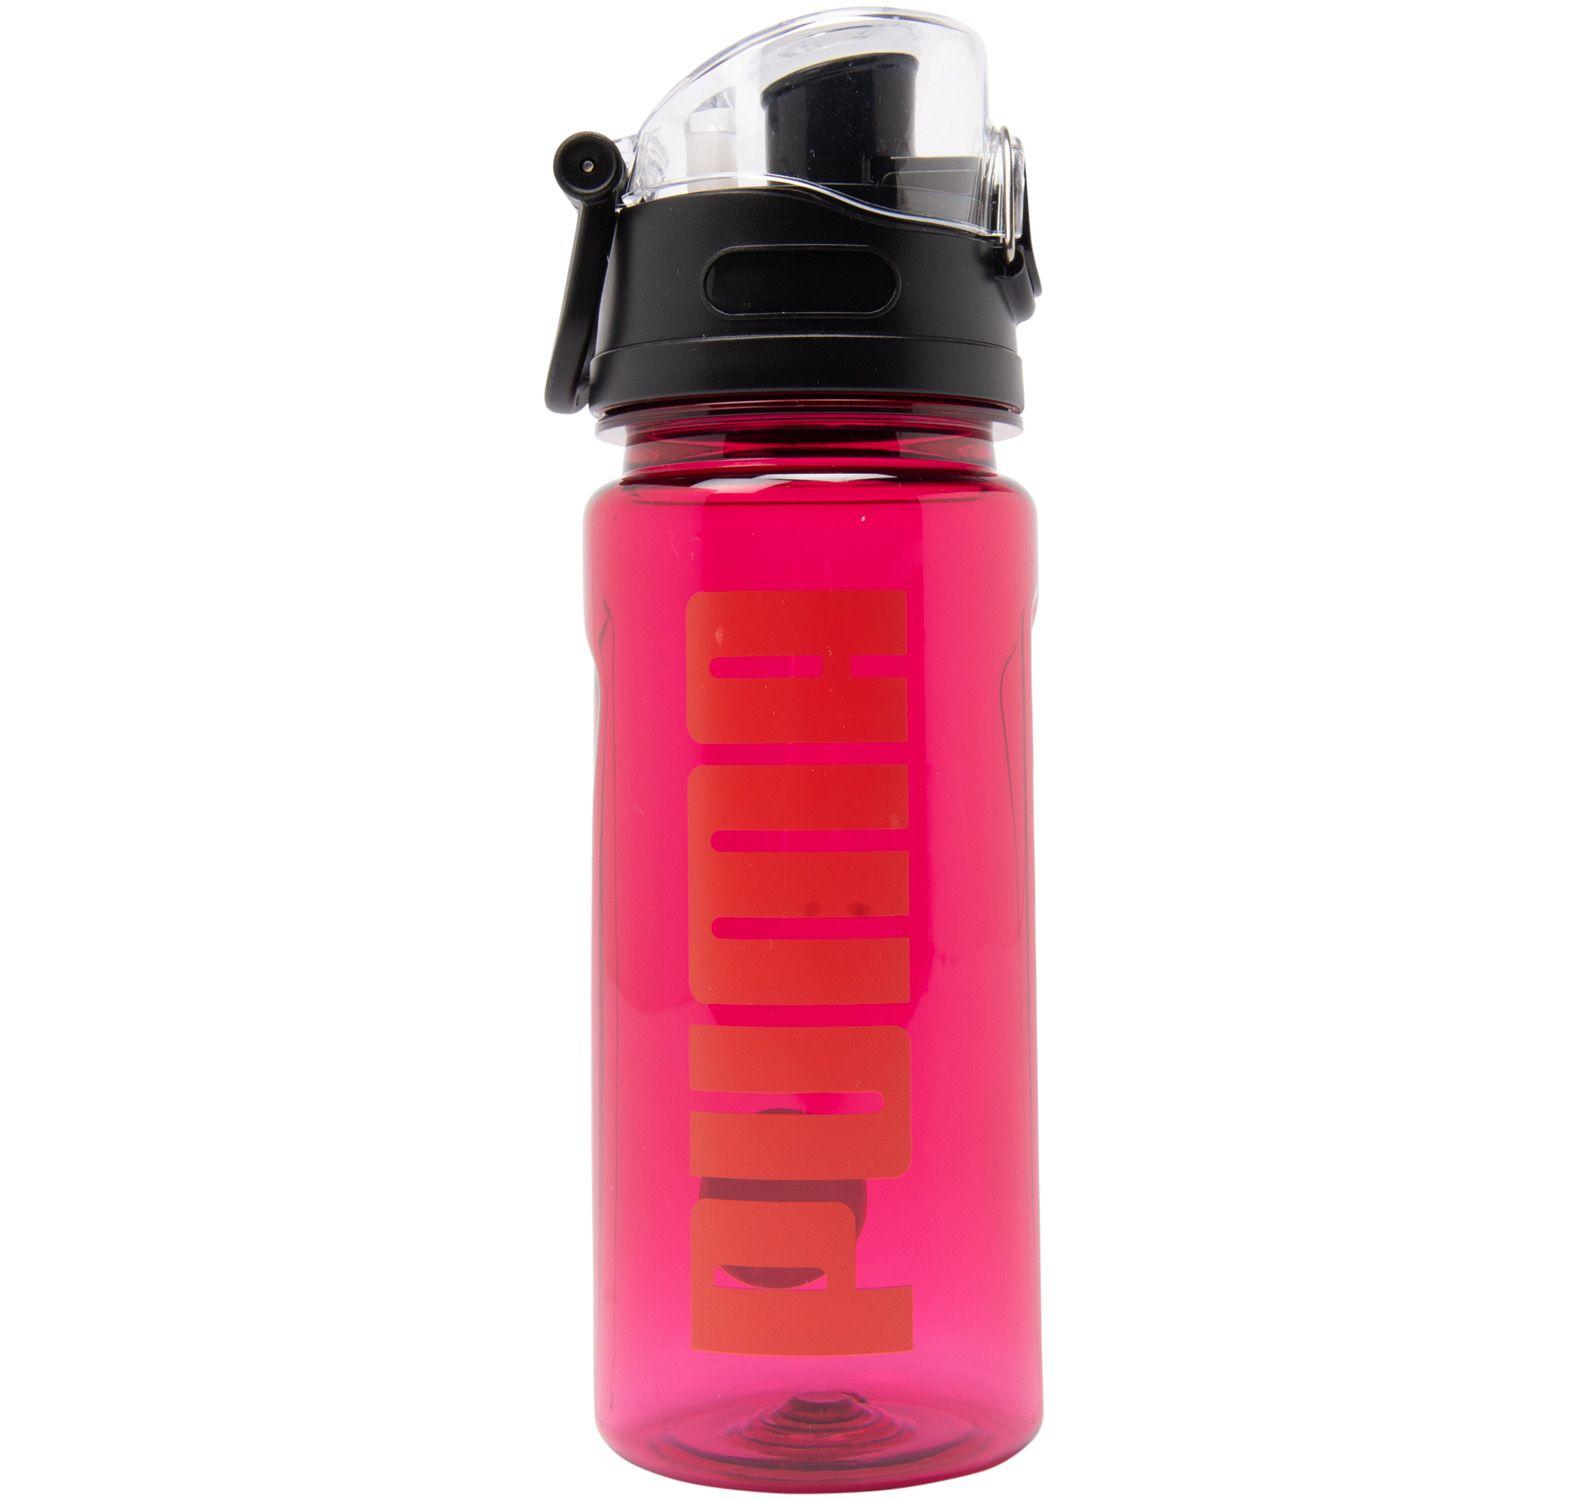 Puma Tr Bottle Sportstyle, Rhubarb-Cherry Tomato, One Size, Puma